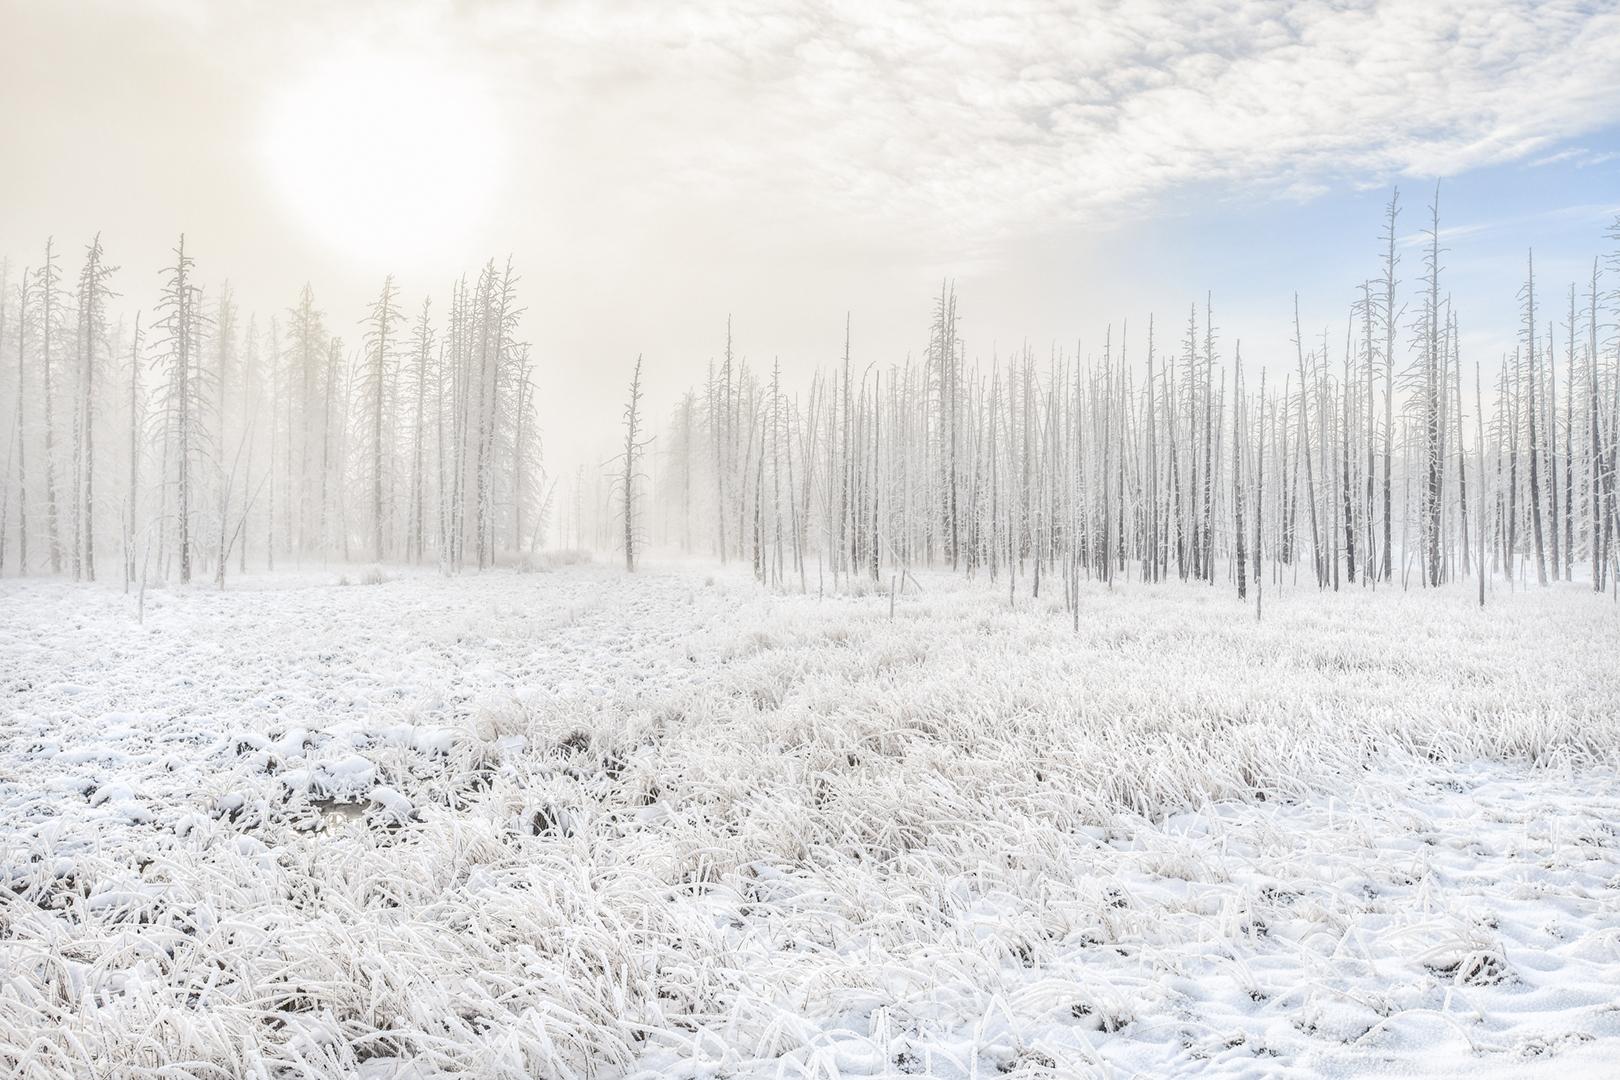 Moring Mist II, Yellowstone